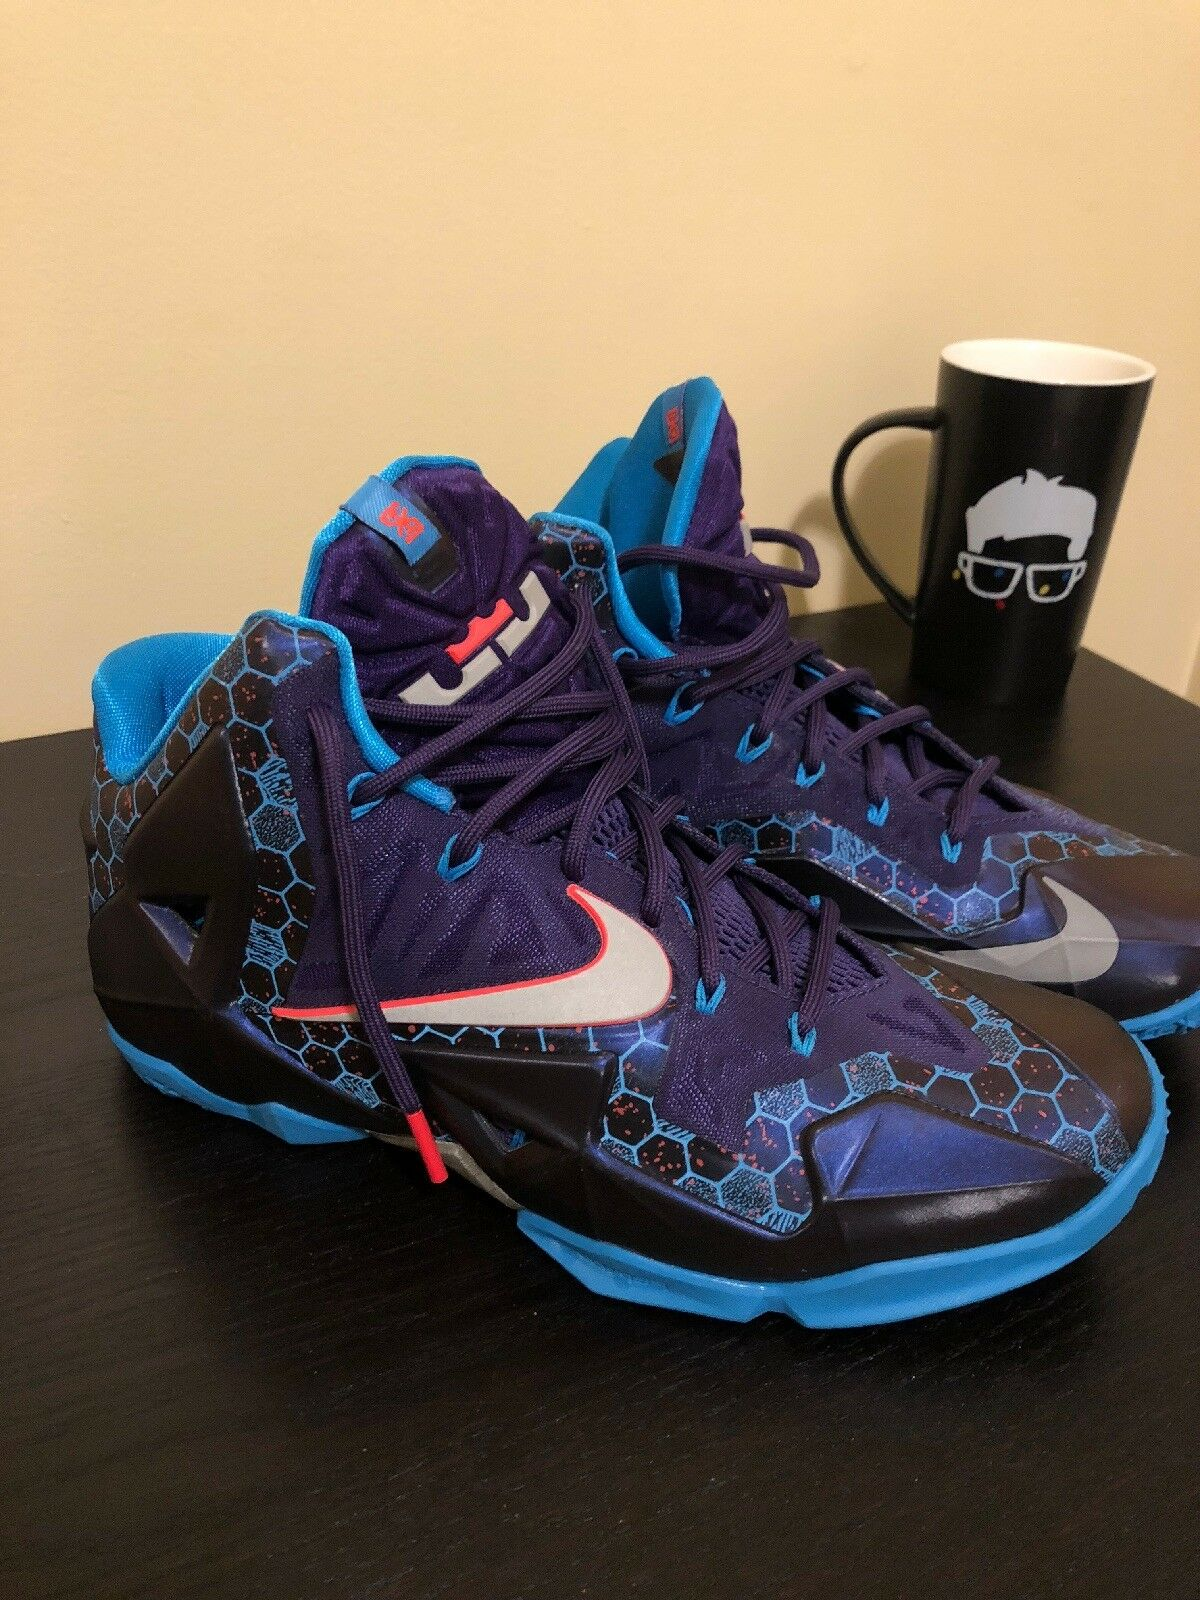 Nike Lebron 11 XI Summit Lake Hornets Size 8.5 616175-500 Purple Basketball